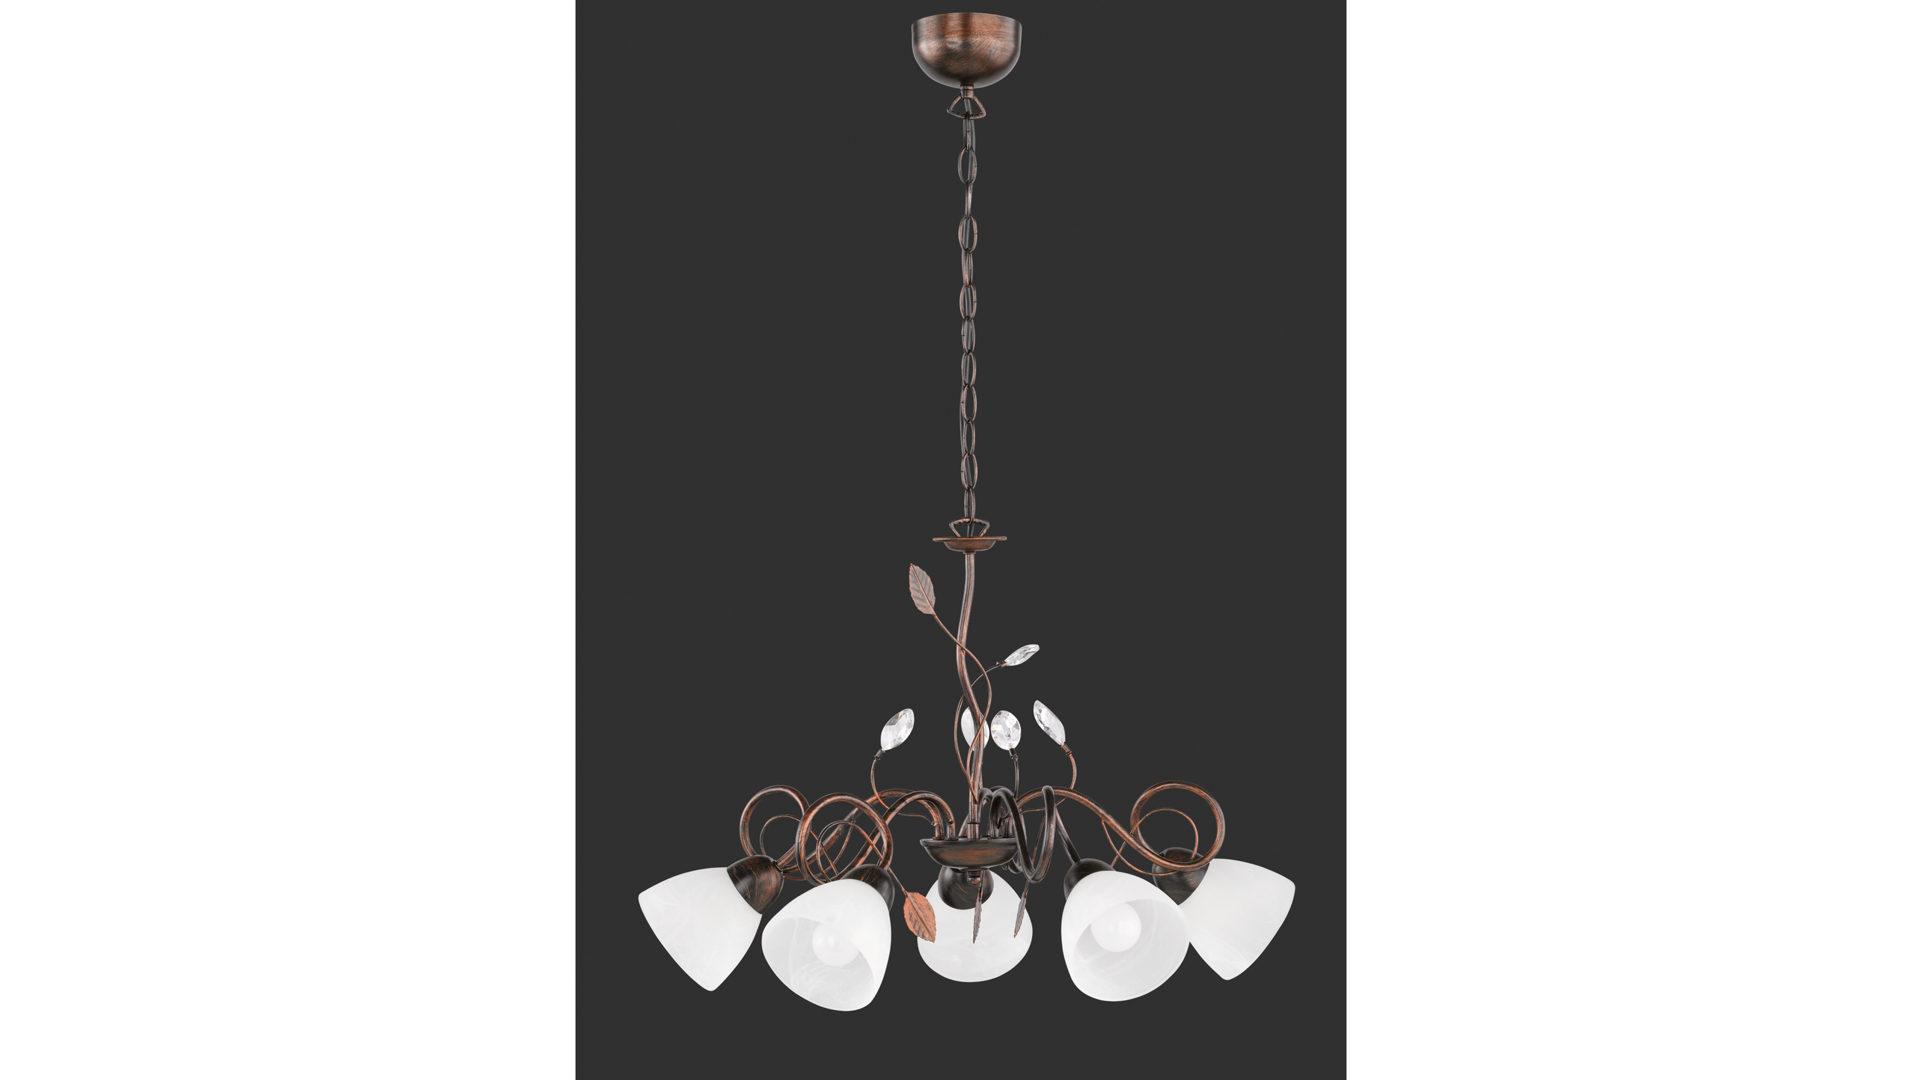 Kronleuchter Diele ~ Kronleuchter antik rostfarbenes metall u fünf lampenschirme